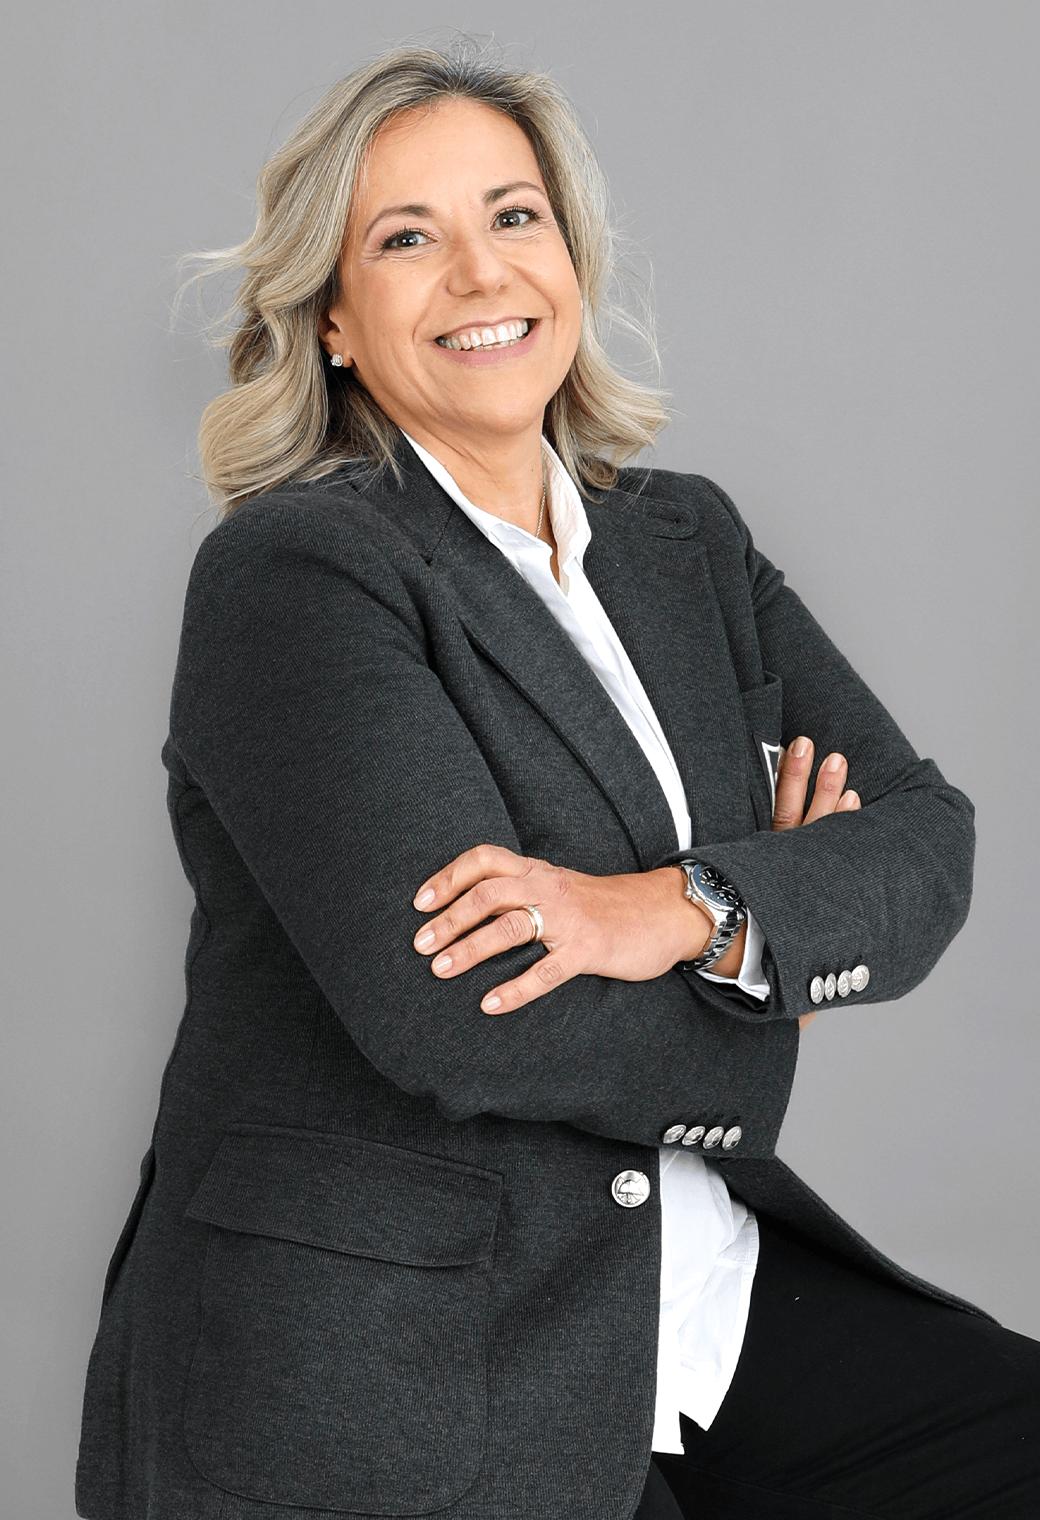 Susana Carreira